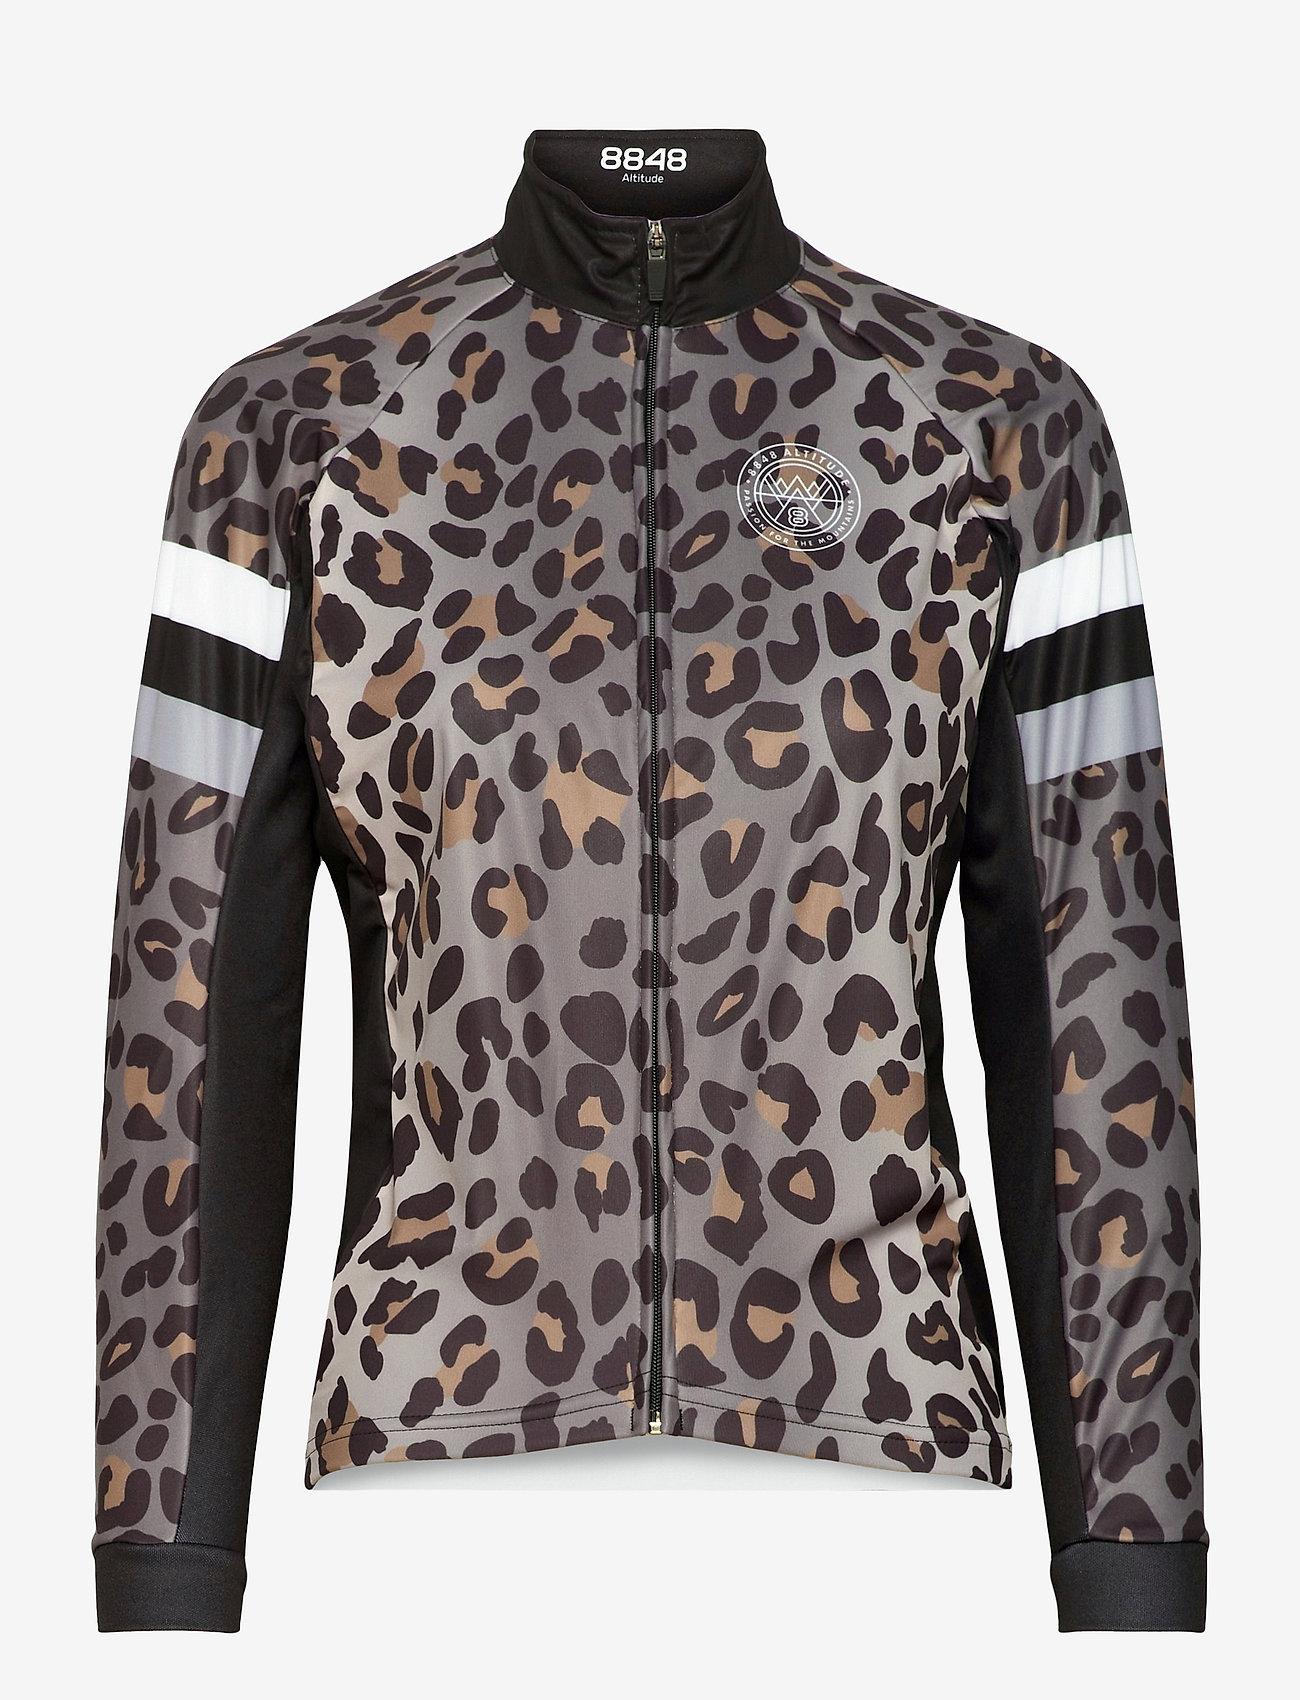 8848 Altitude - Cherie W Jacket - sports jackets - leopard - 0